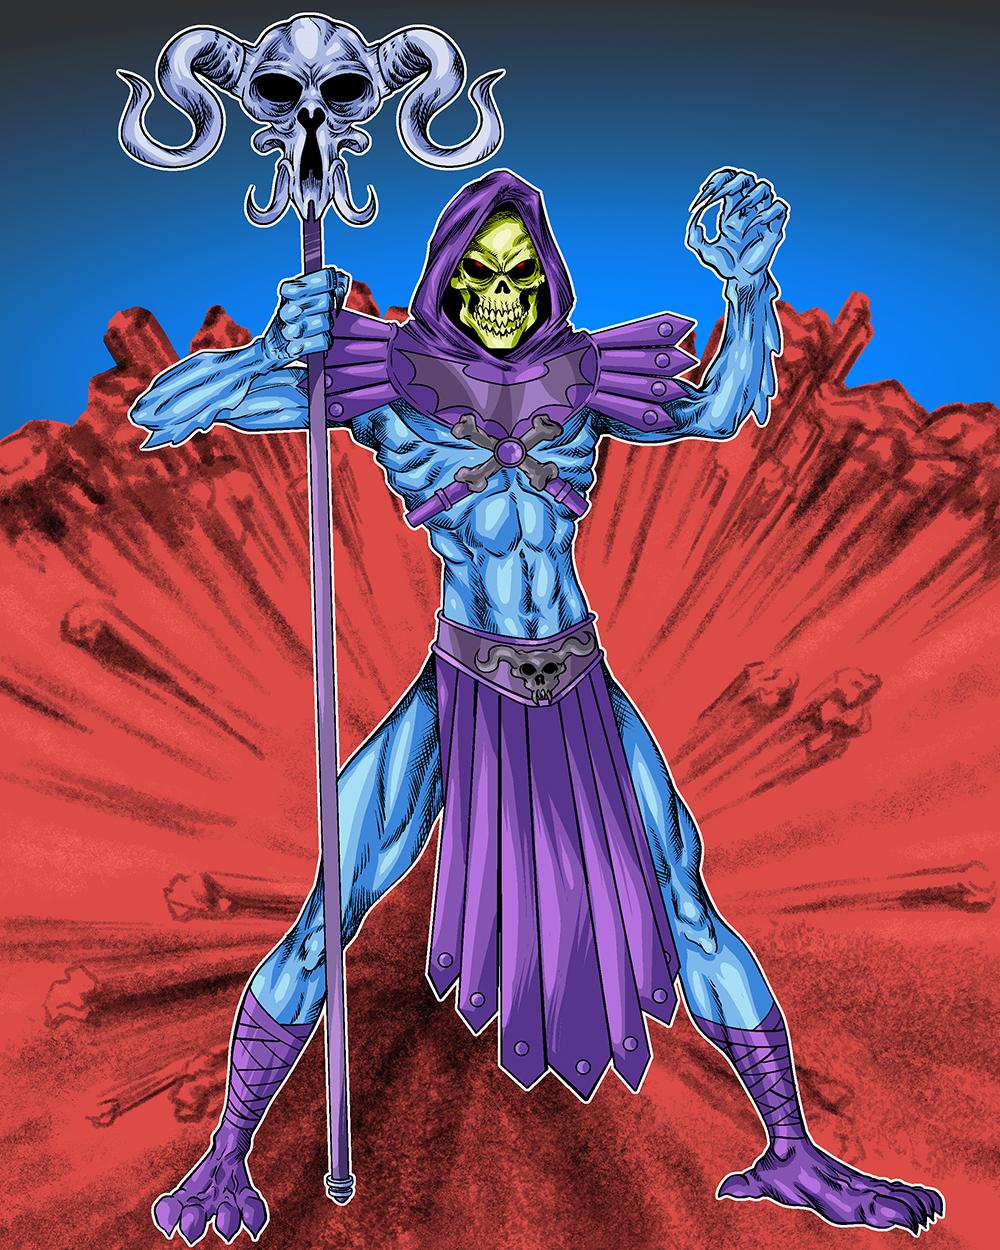 2. Skeletor